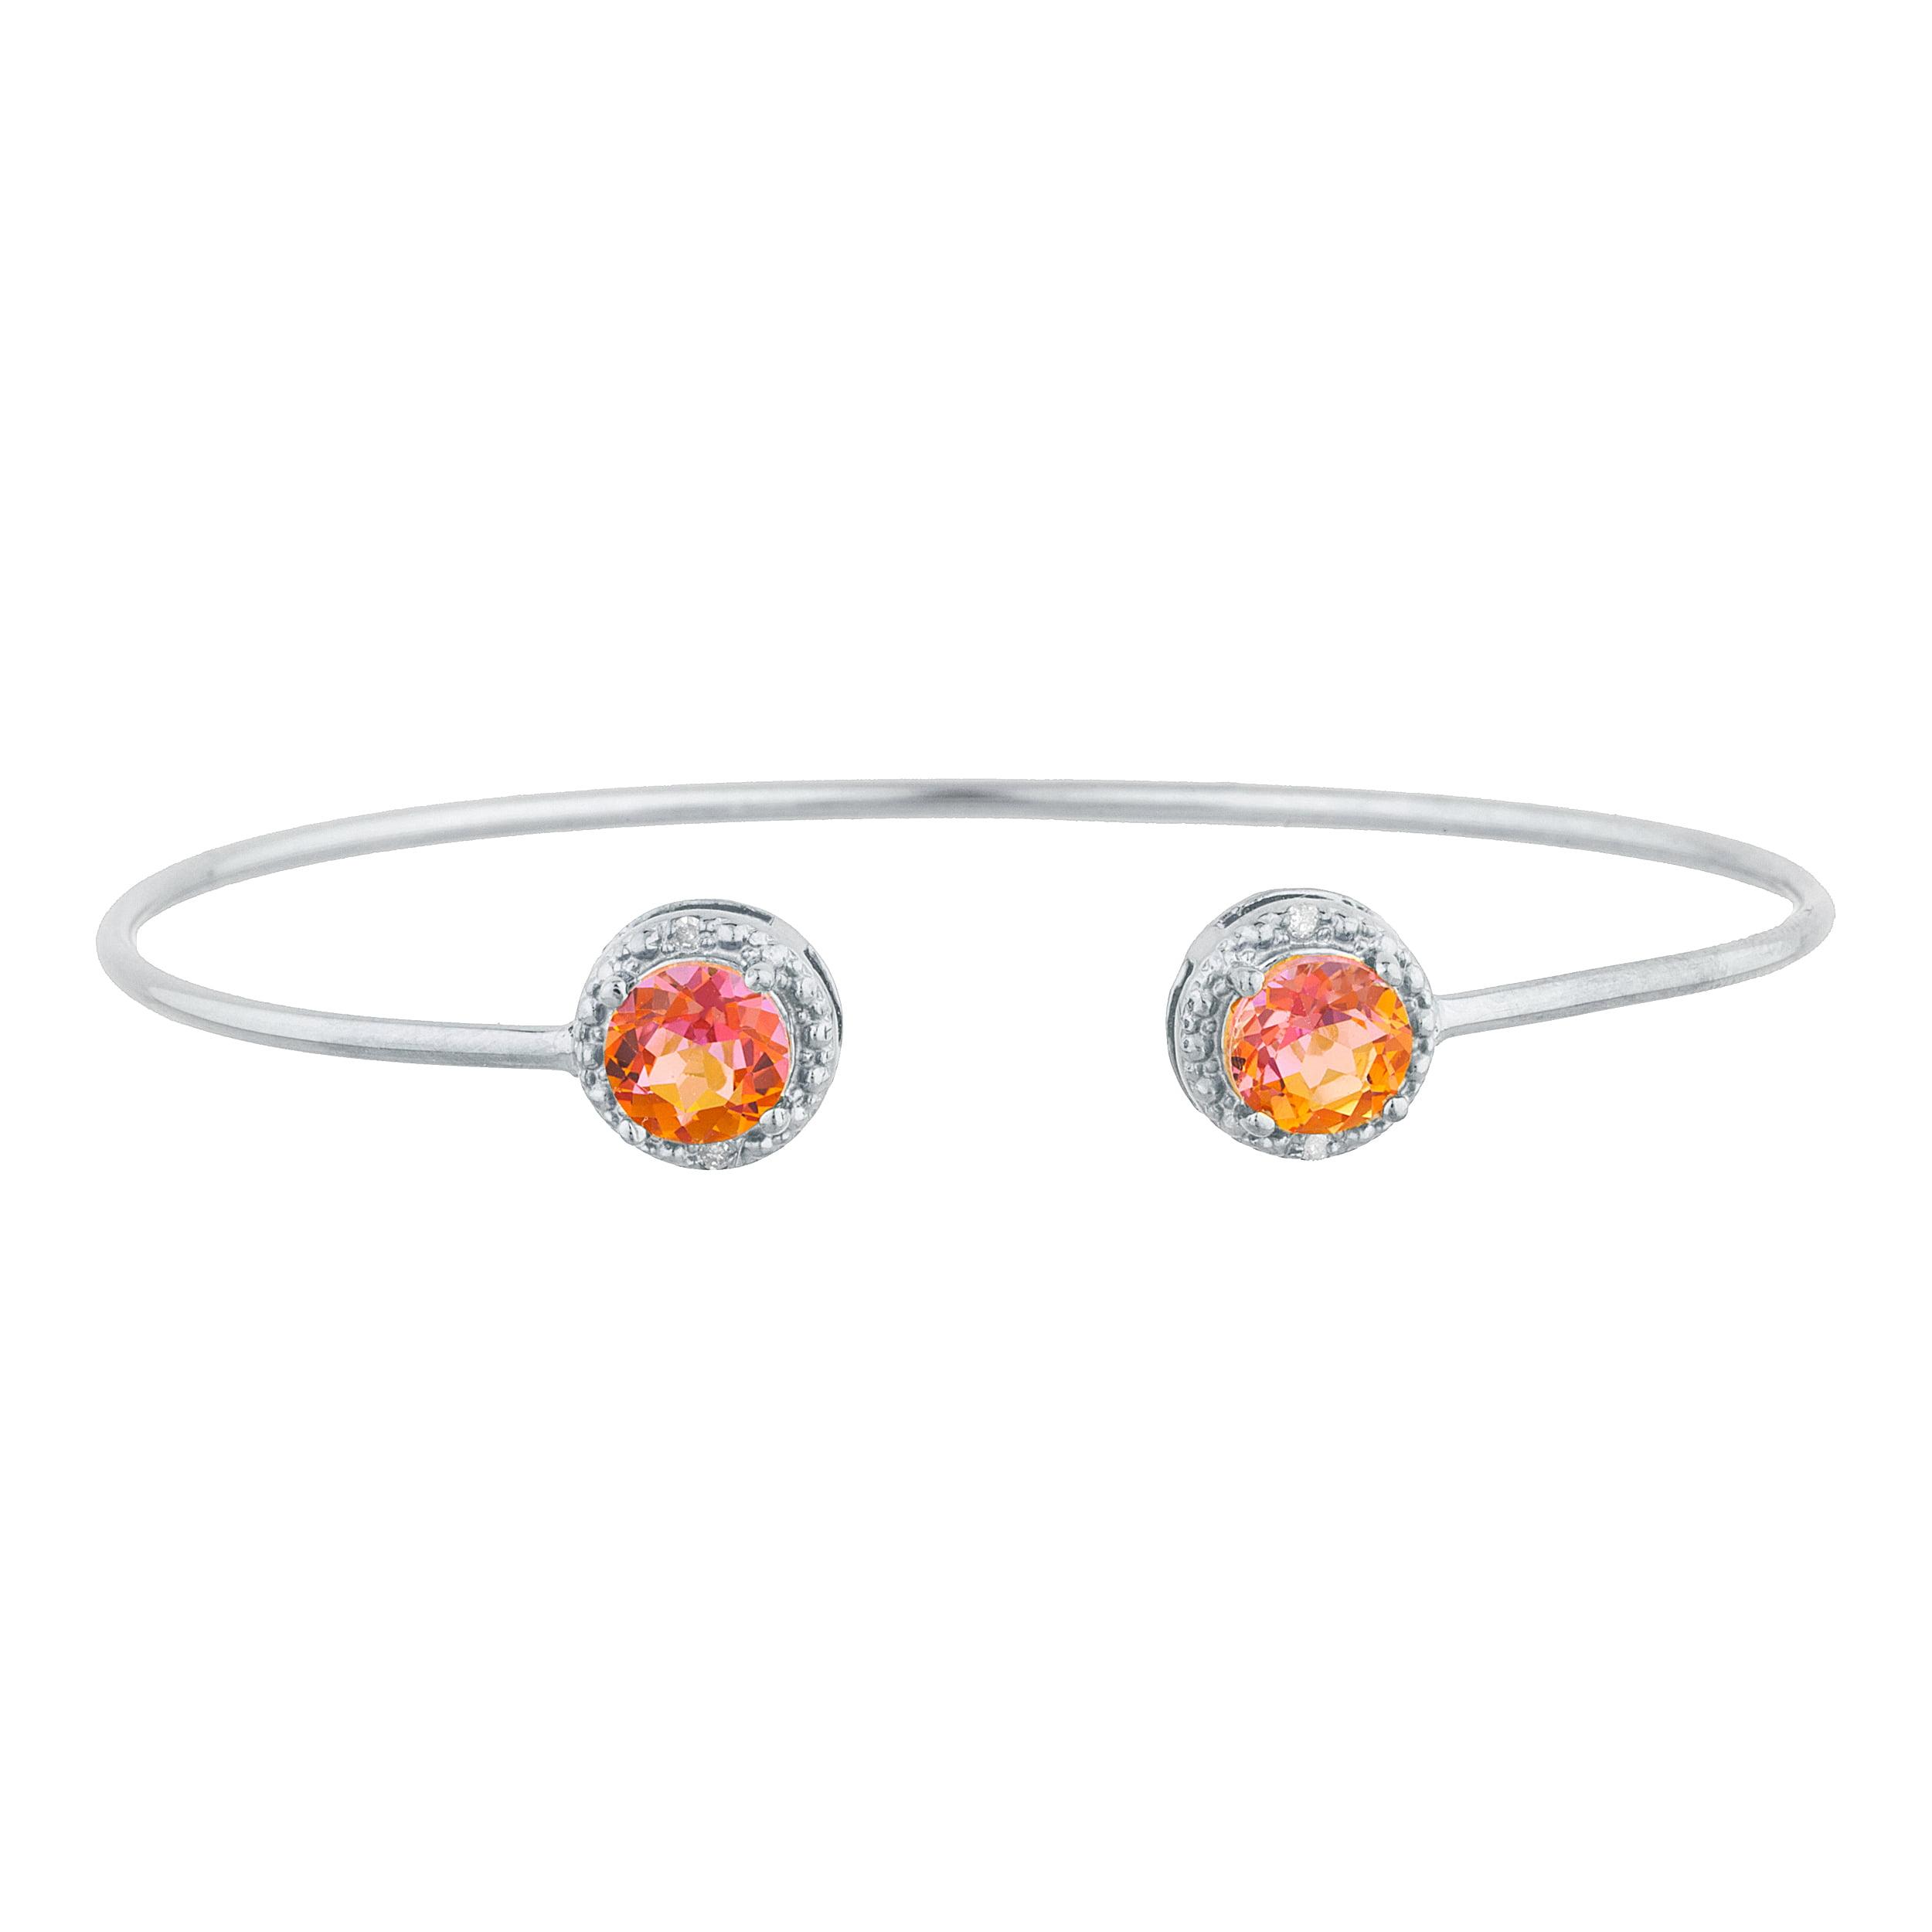 2 Ct Natural Ecstasy Mystic Topaz & Diamond Round Bangle Bracelet .925 Sterling Silver by Elizabeth Jewelry Inc